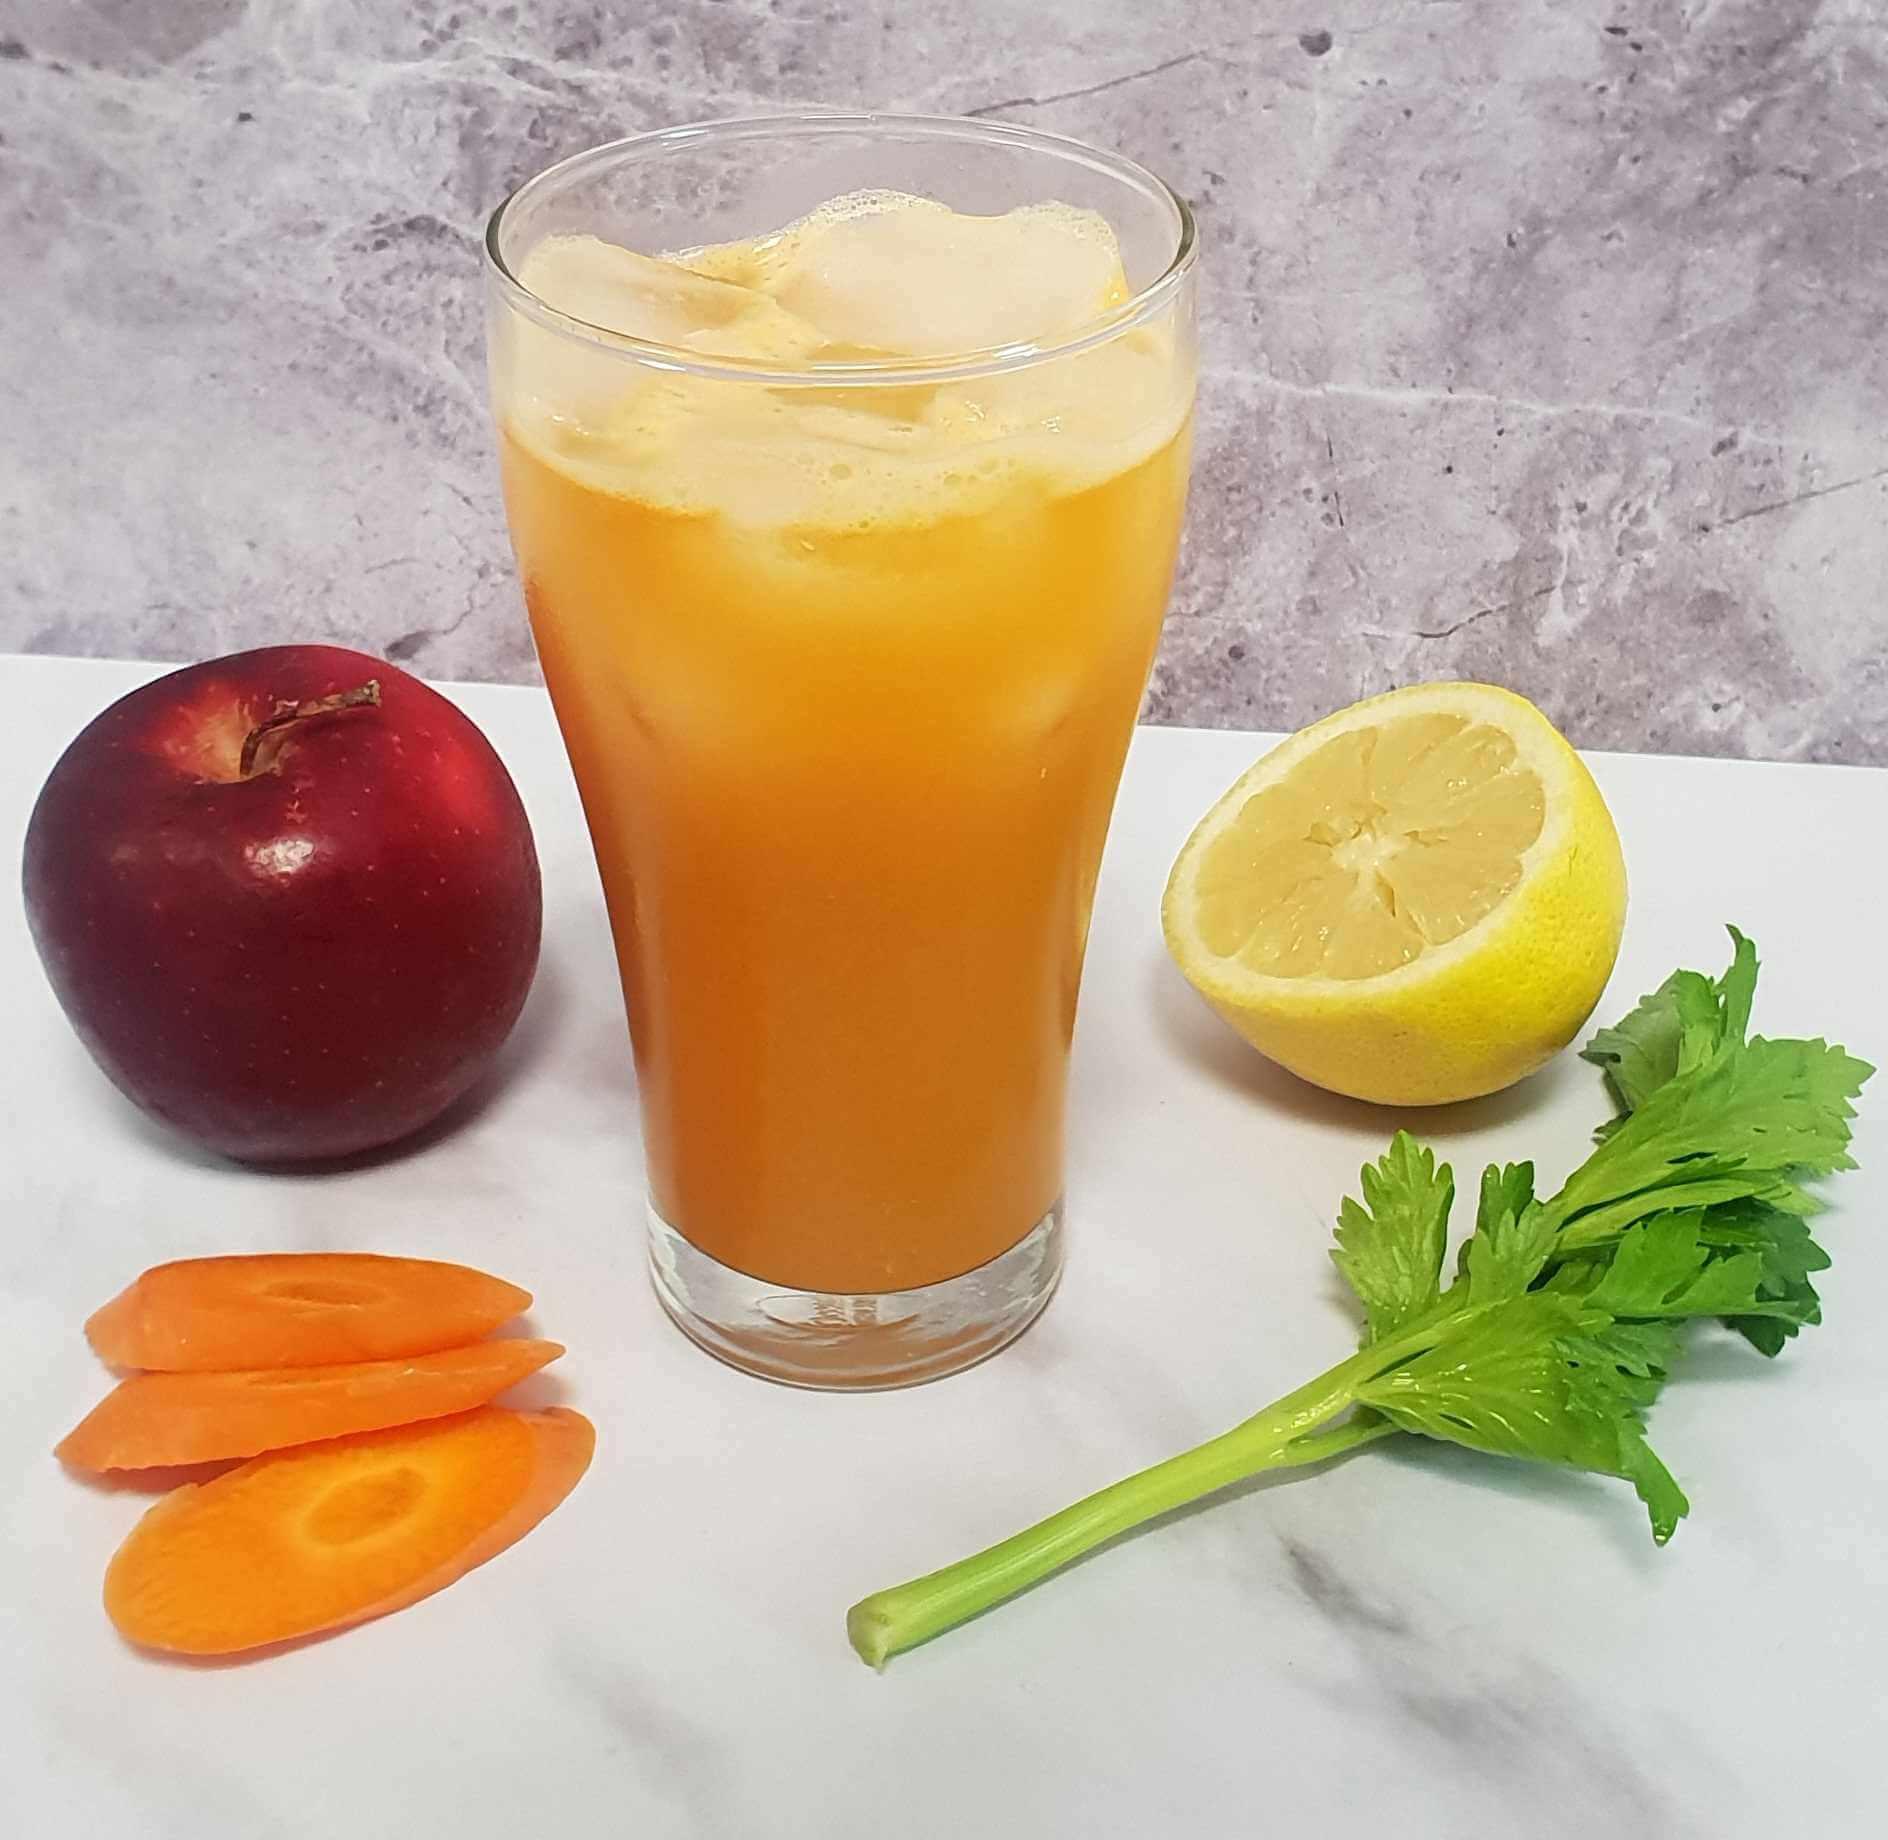 The Sweetydox Juice - Carrot, Apple, and Celery Recipe